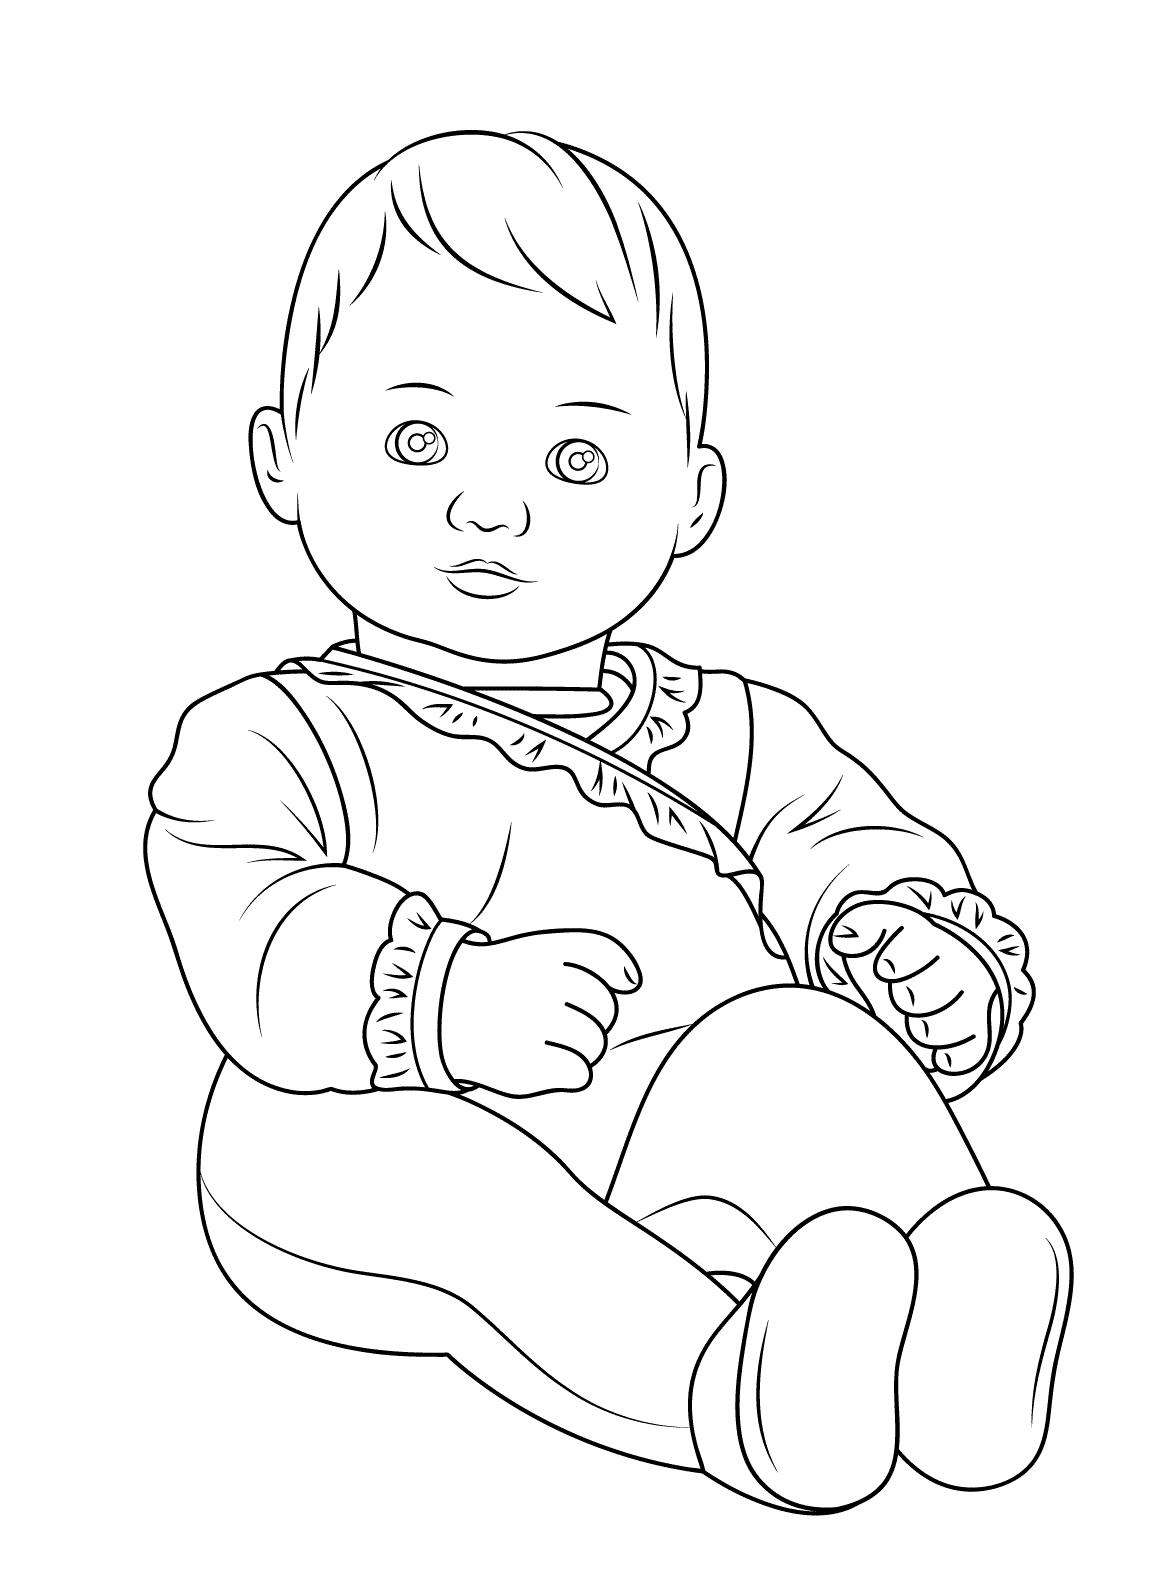 coloring book for babies american girl coloring pages best coloring pages for kids coloring for babies book